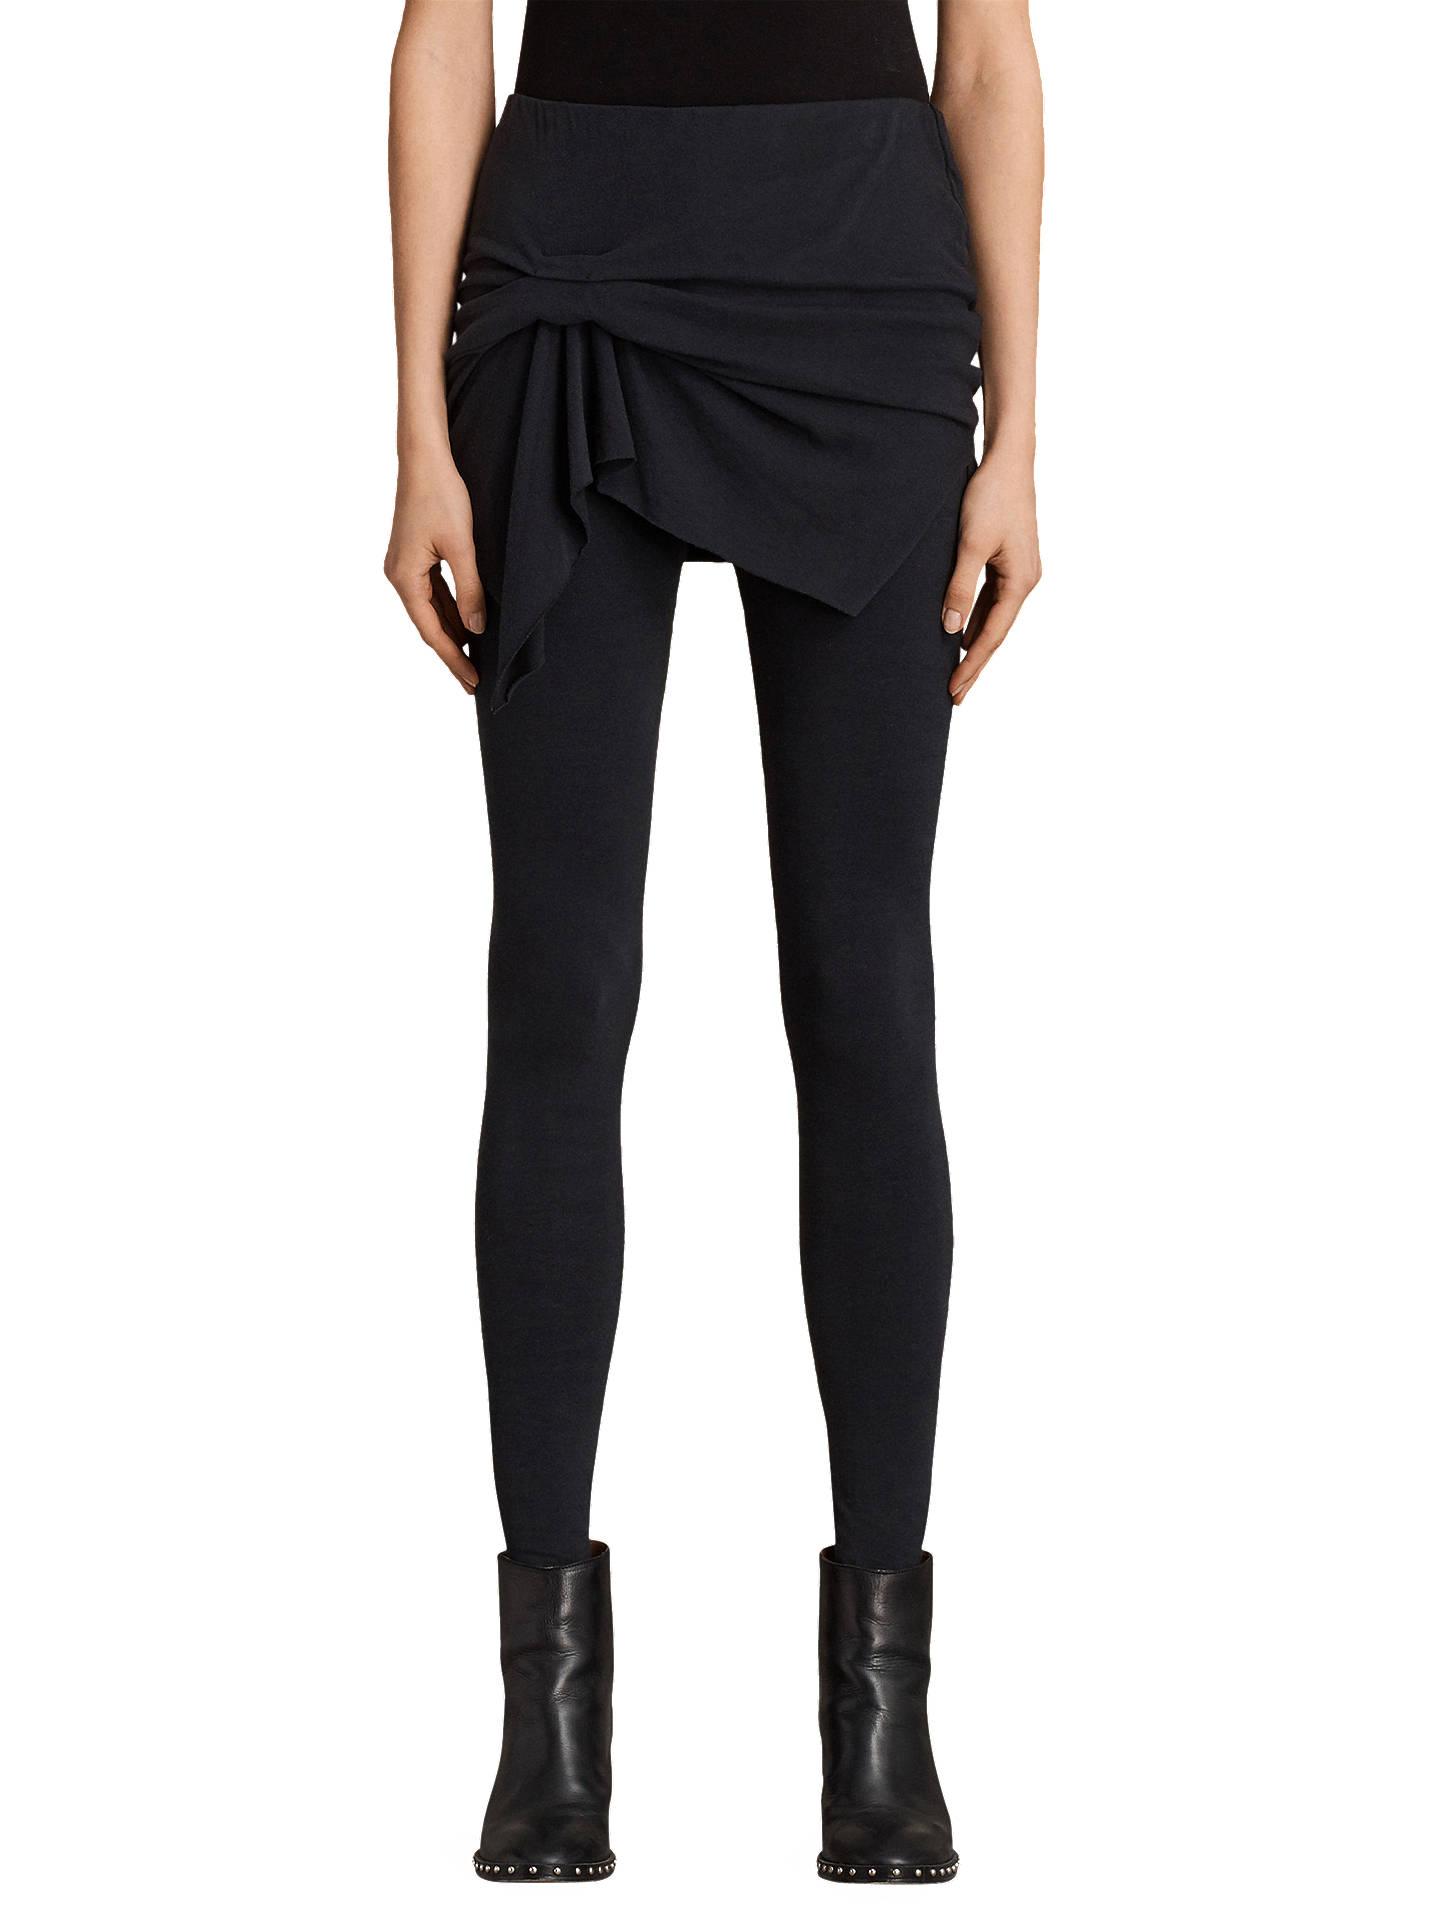 1fd4f6a3813a1 Buy AllSaints Raffi Riviera Leggings, Black, XS Online at johnlewis.com ...